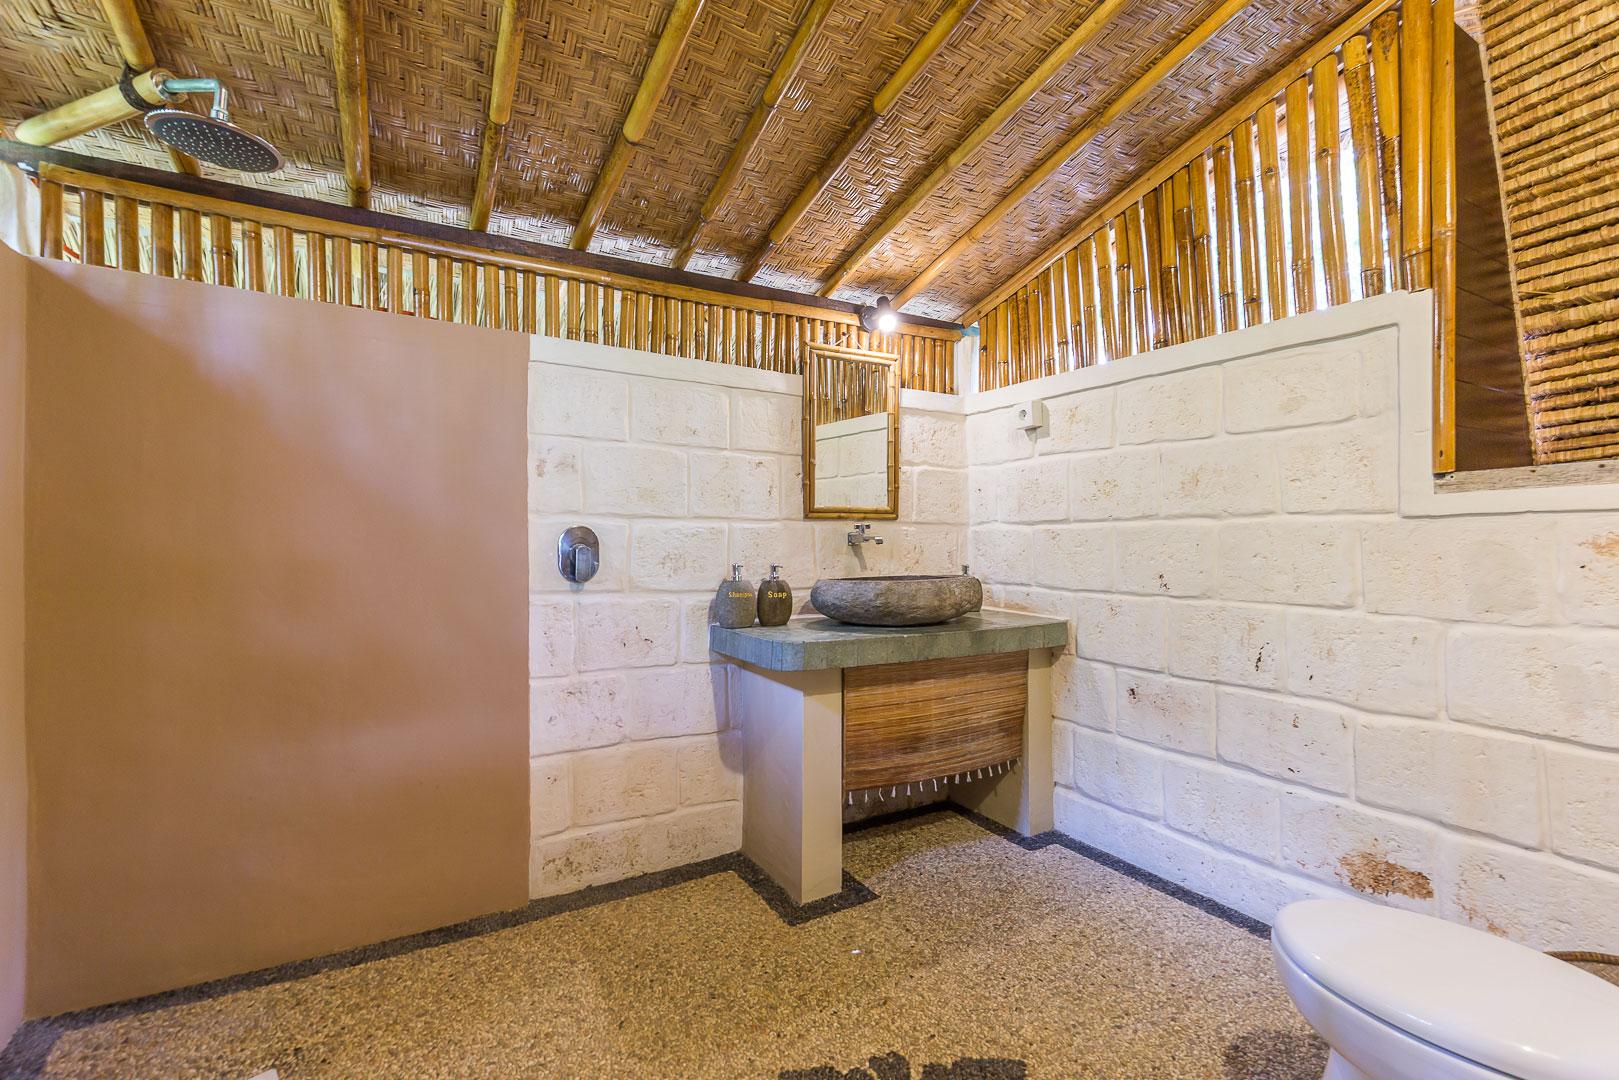 Location-bungalows-maison-hote-hotel-milos-home-L7-rhodochrosite-4